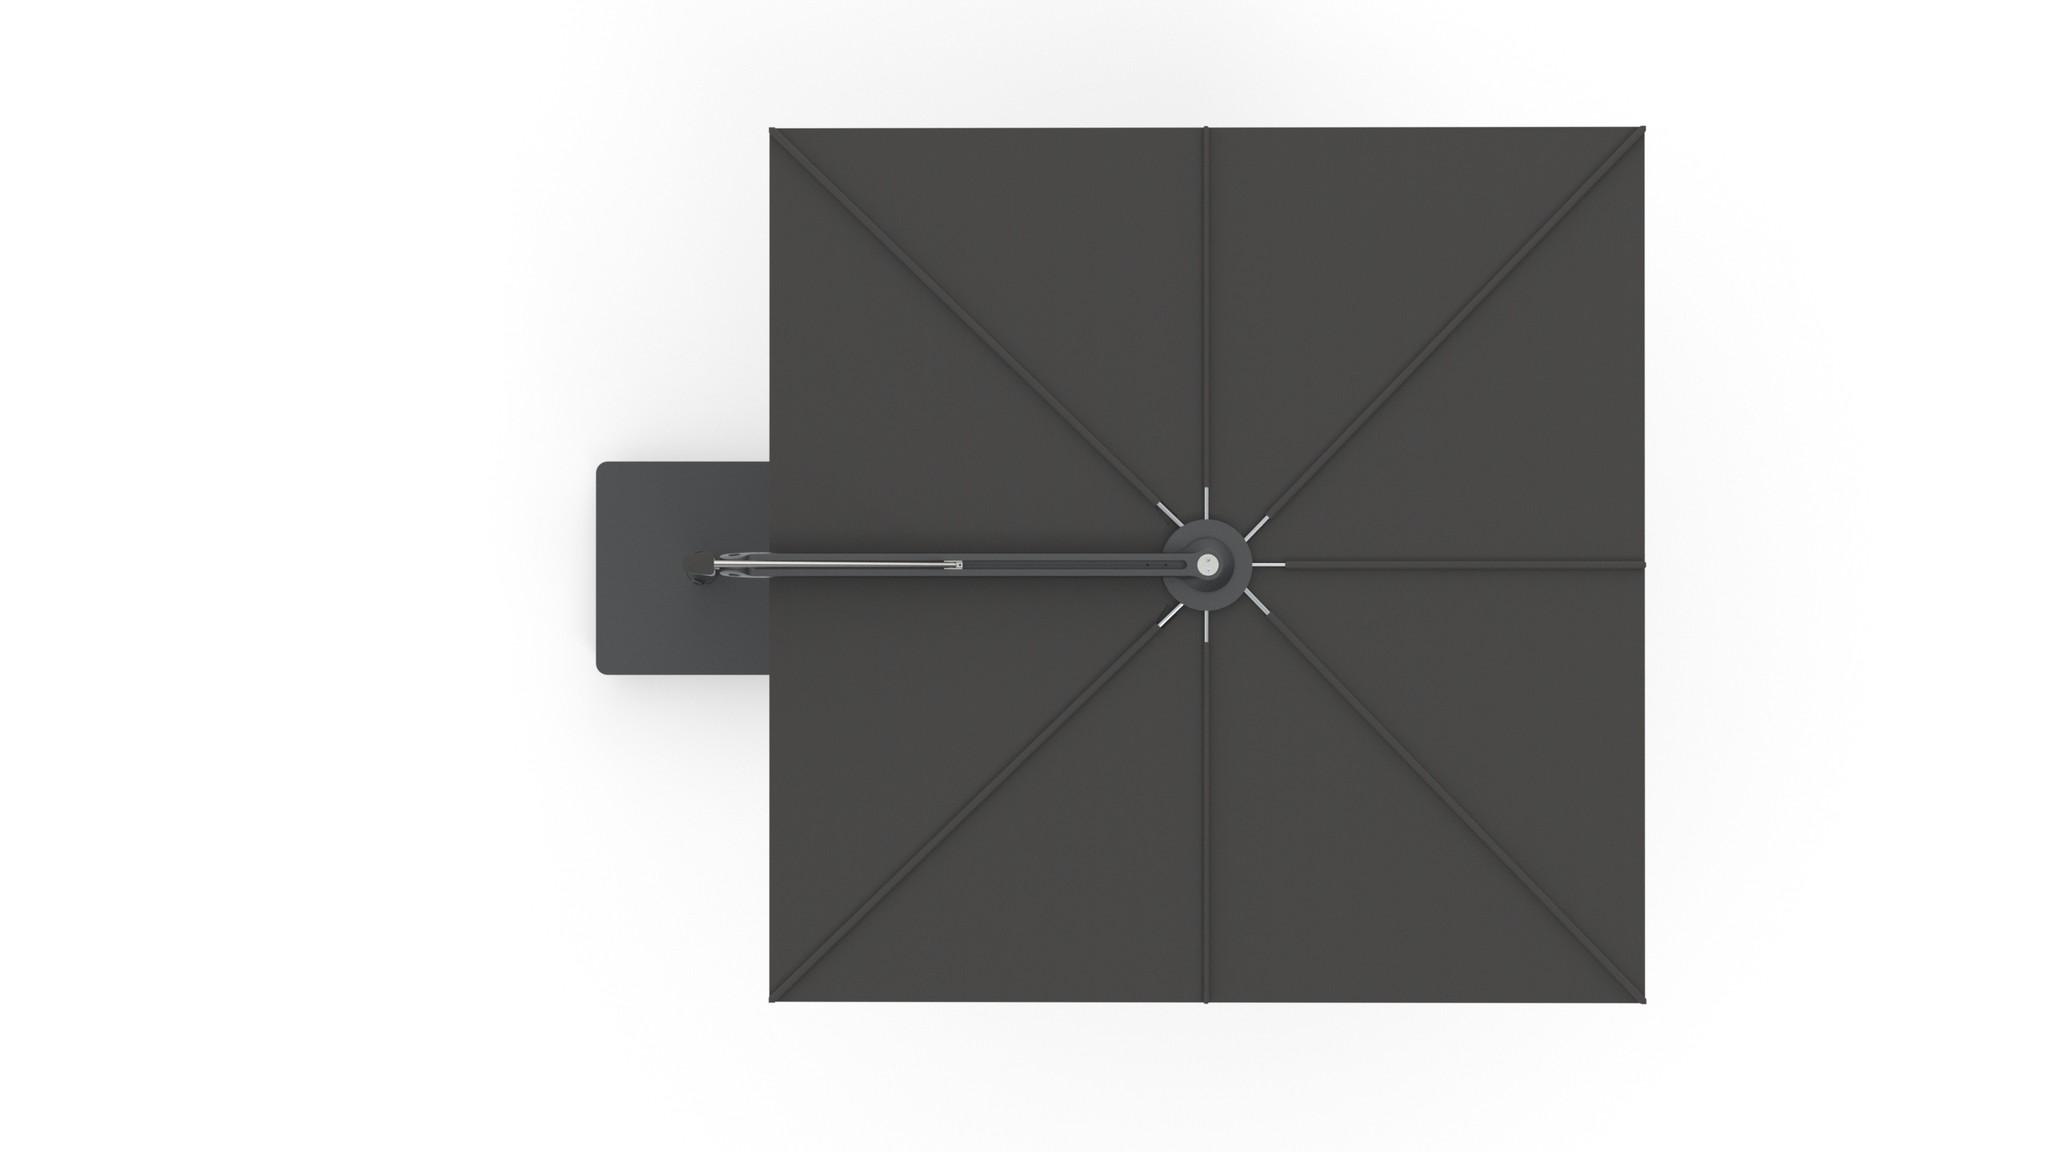 Spectra UX architecture FULL BLACK